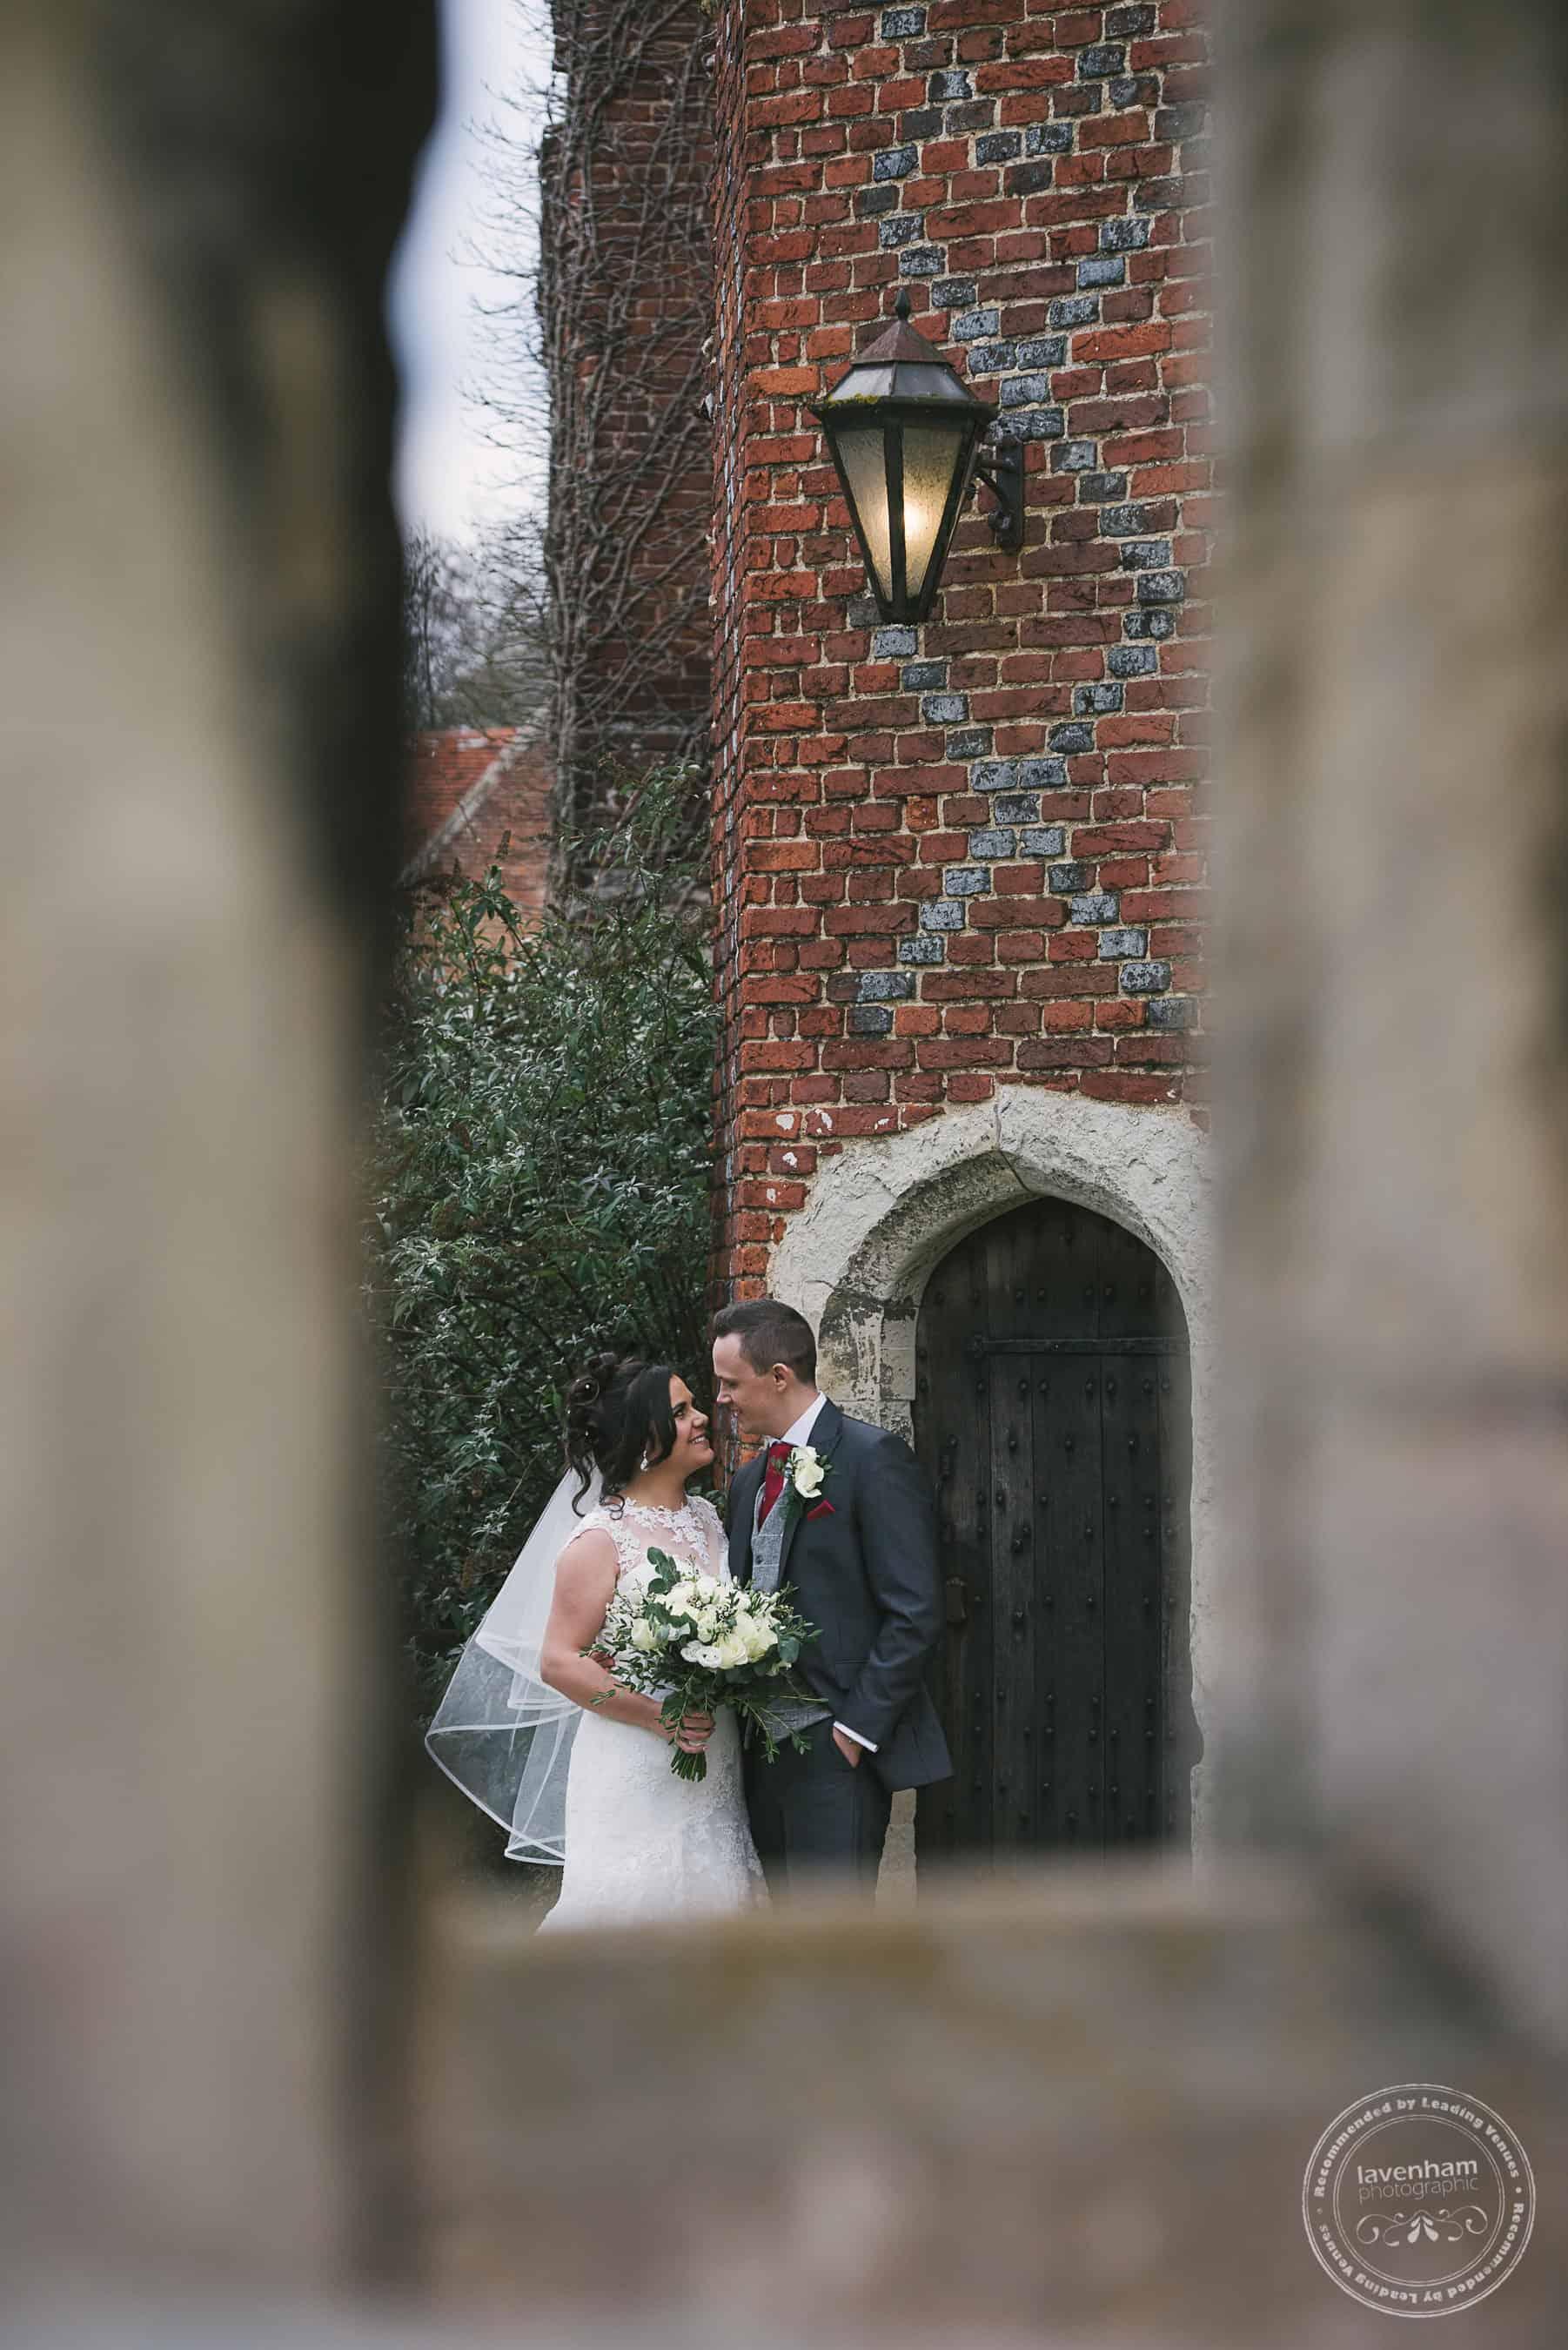 251118 Leez Priory Wedding Photography by Lavenham Photographic 087